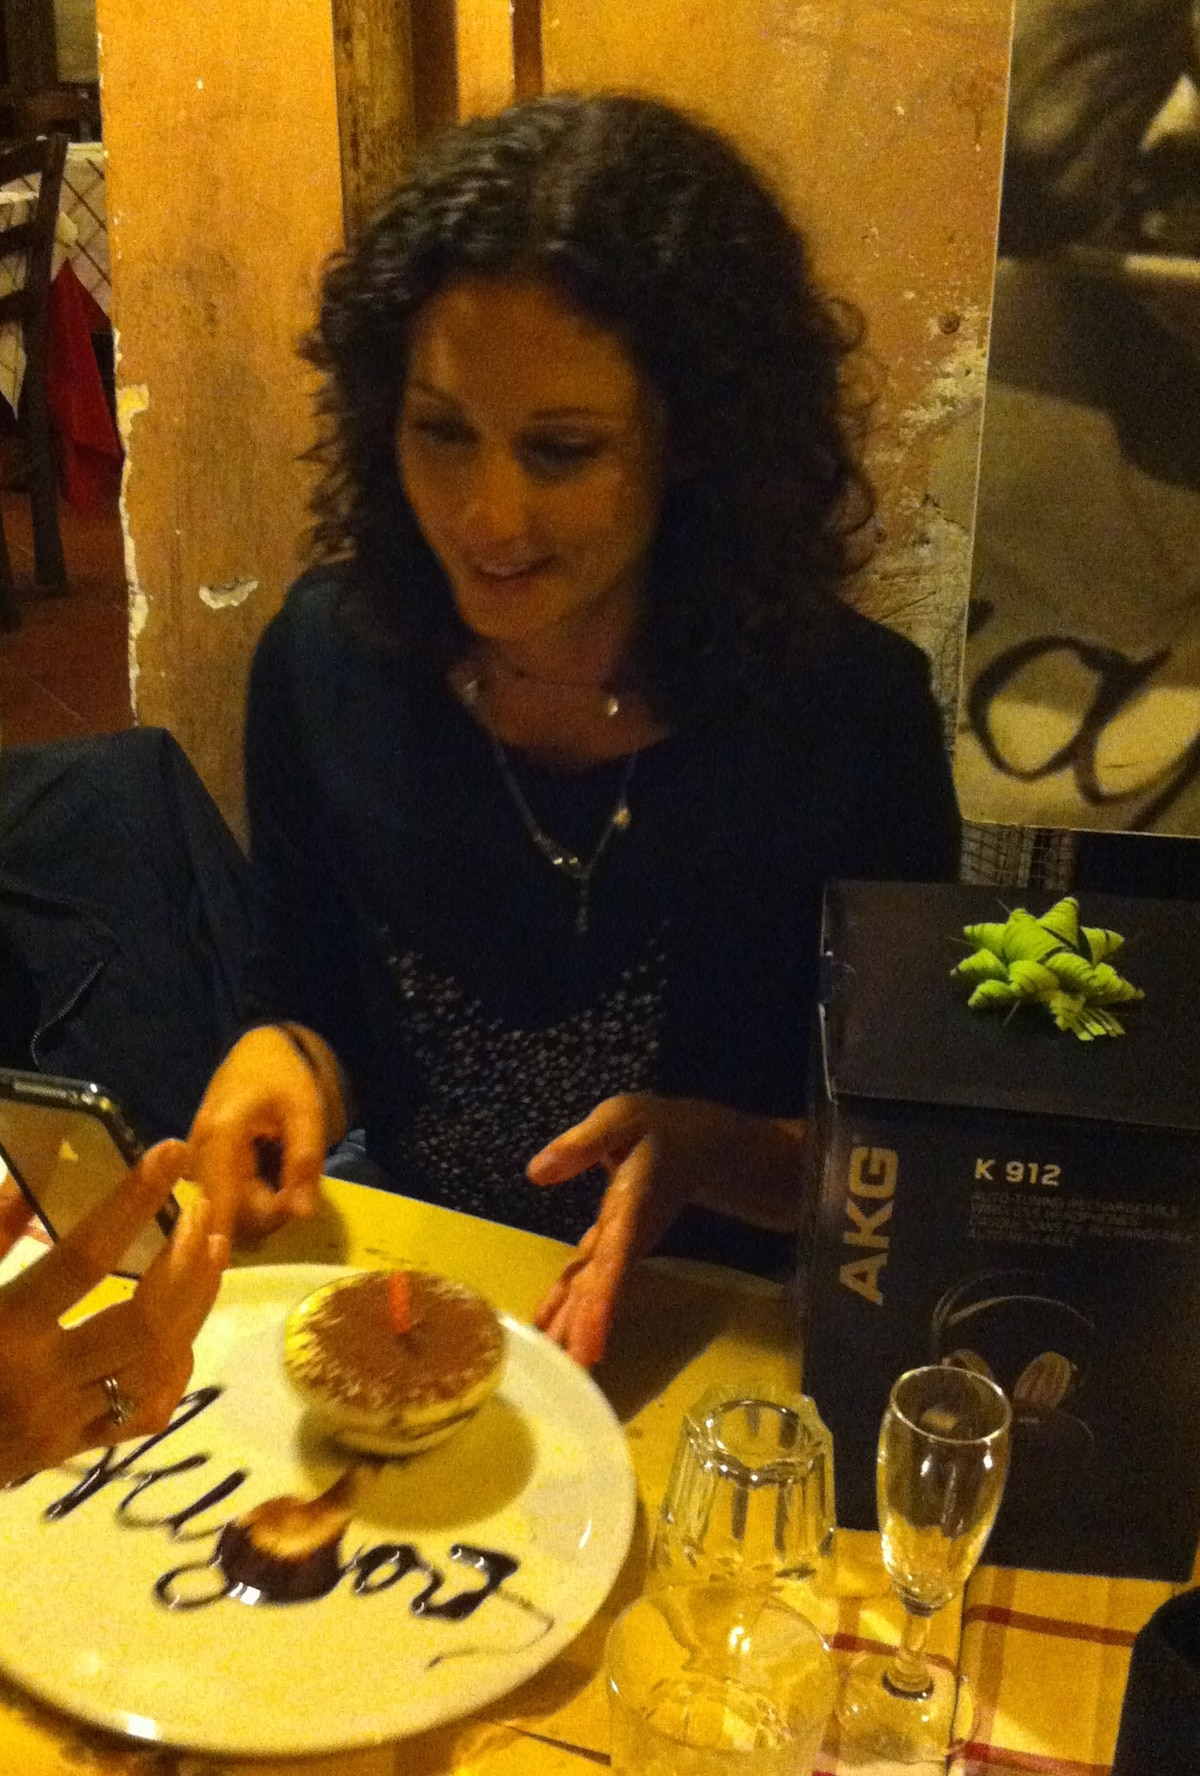 Giulia from Rome